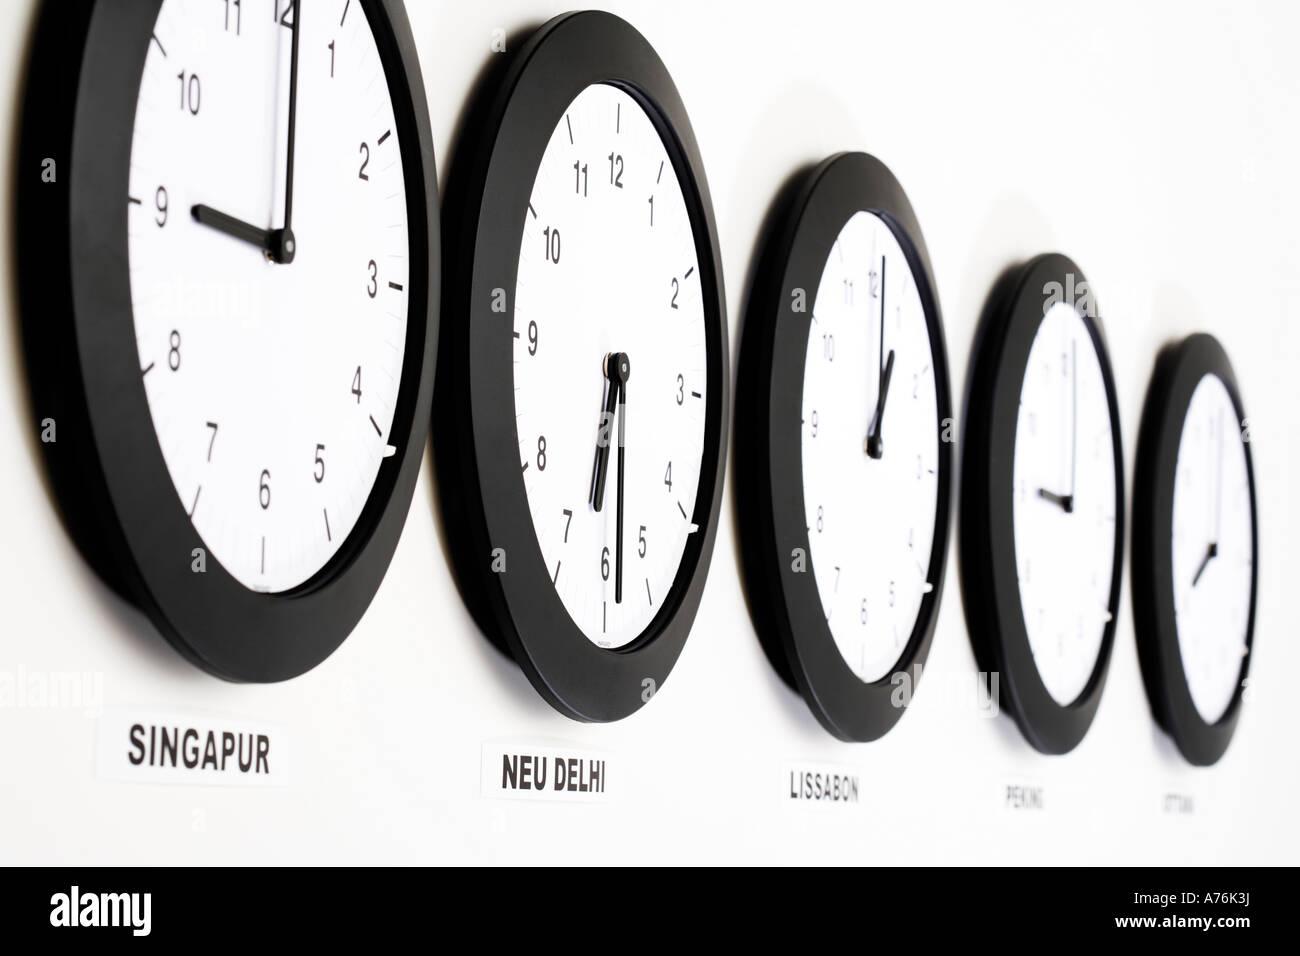 Horloges de mur, fermer, haut, symbole de l'heure de Greenwich Photo Stock